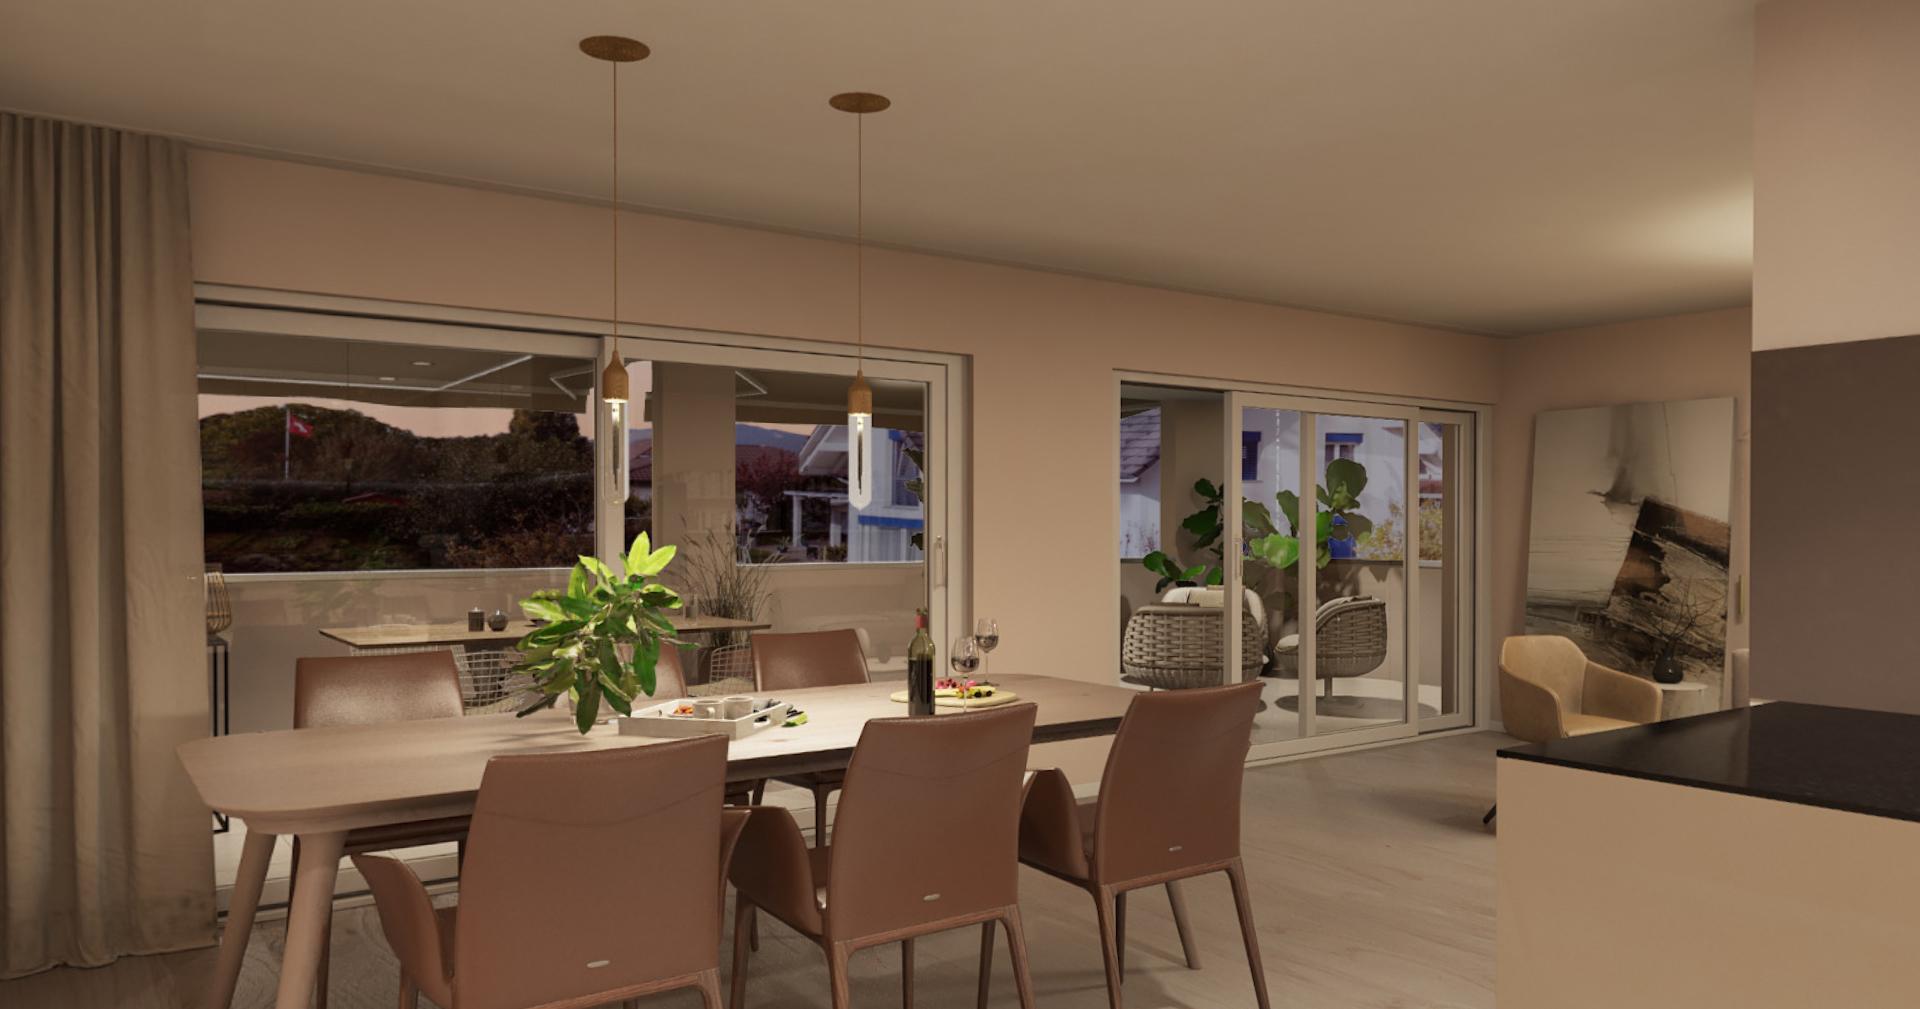 westfield_mehrfamilienhaus_haerkingen_kueche_4.5_zimmer_wohnung_6.jpg